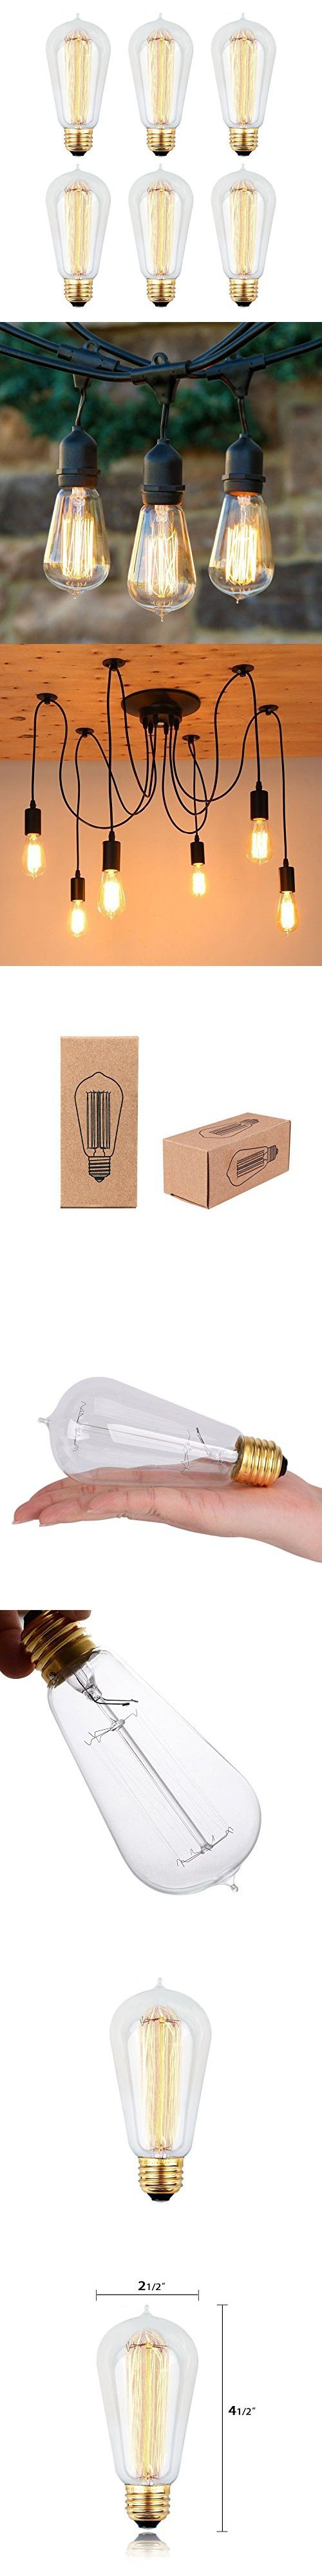 6pcs Edison Bulbs, KinHom 60 Watt Dimmable Vintage Incandescent Light Bulb - E26 Base - Clear Glass - Tear Drop Top - Classic Squirrel Cage Filament Lamp - ST58